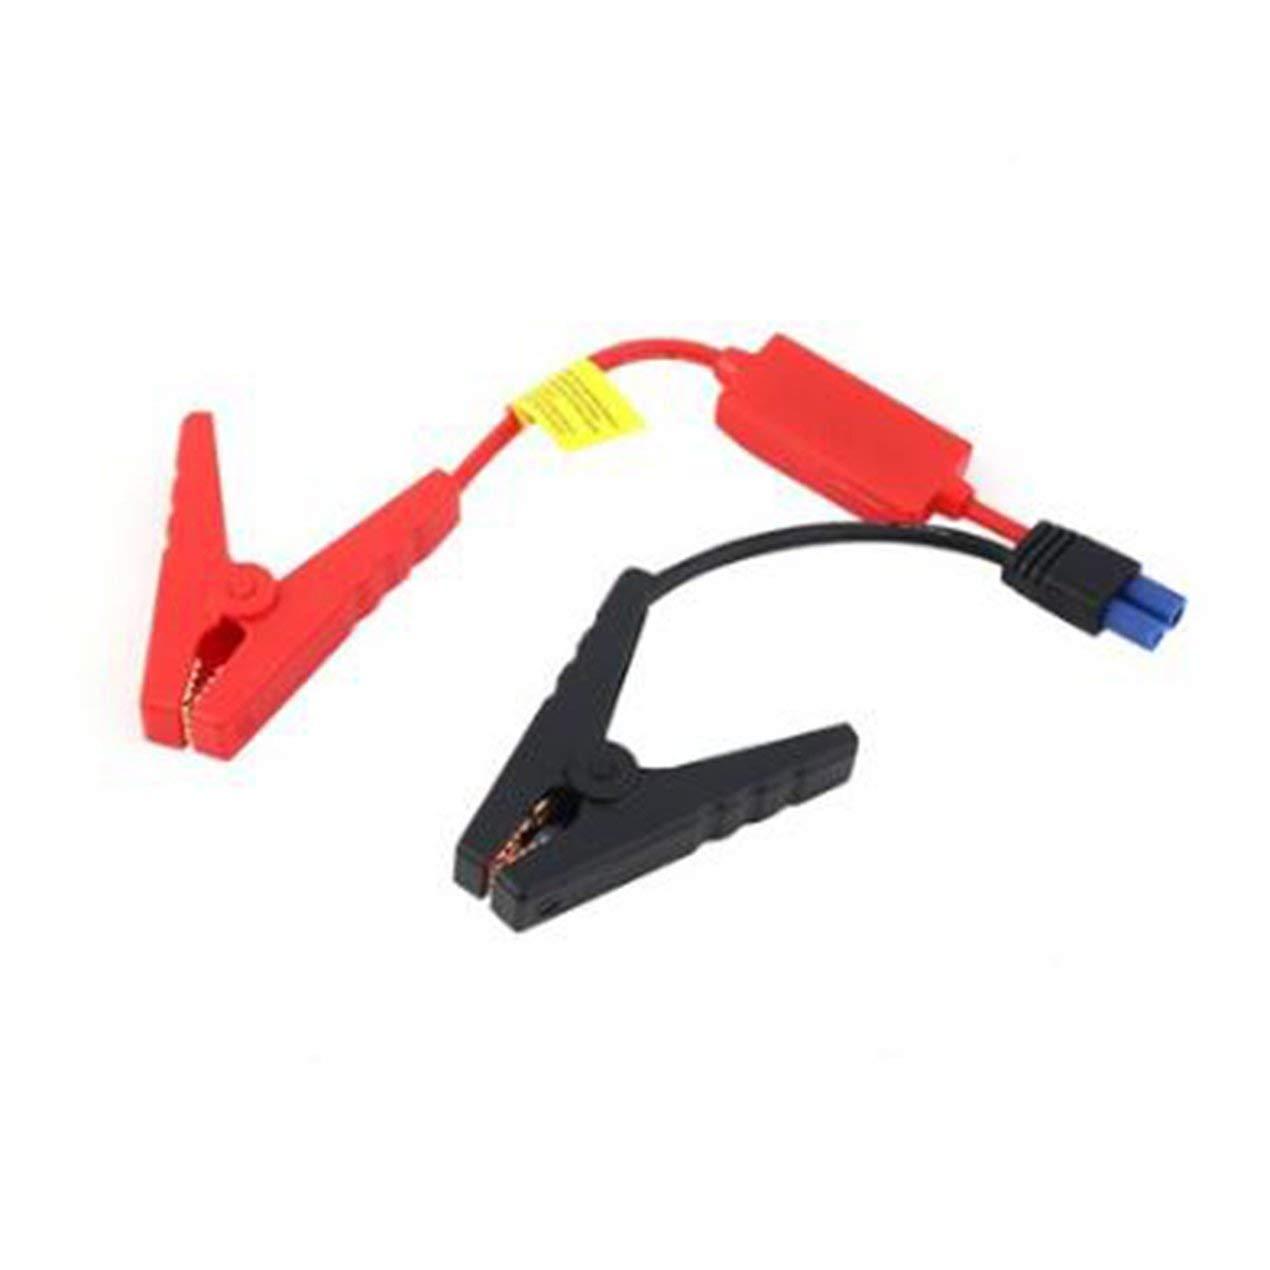 Grande capacit/é 30000/mAh Portable LED de Voiture Jump Starter durgence Start Power Supply v/éhicule Moteur Booster